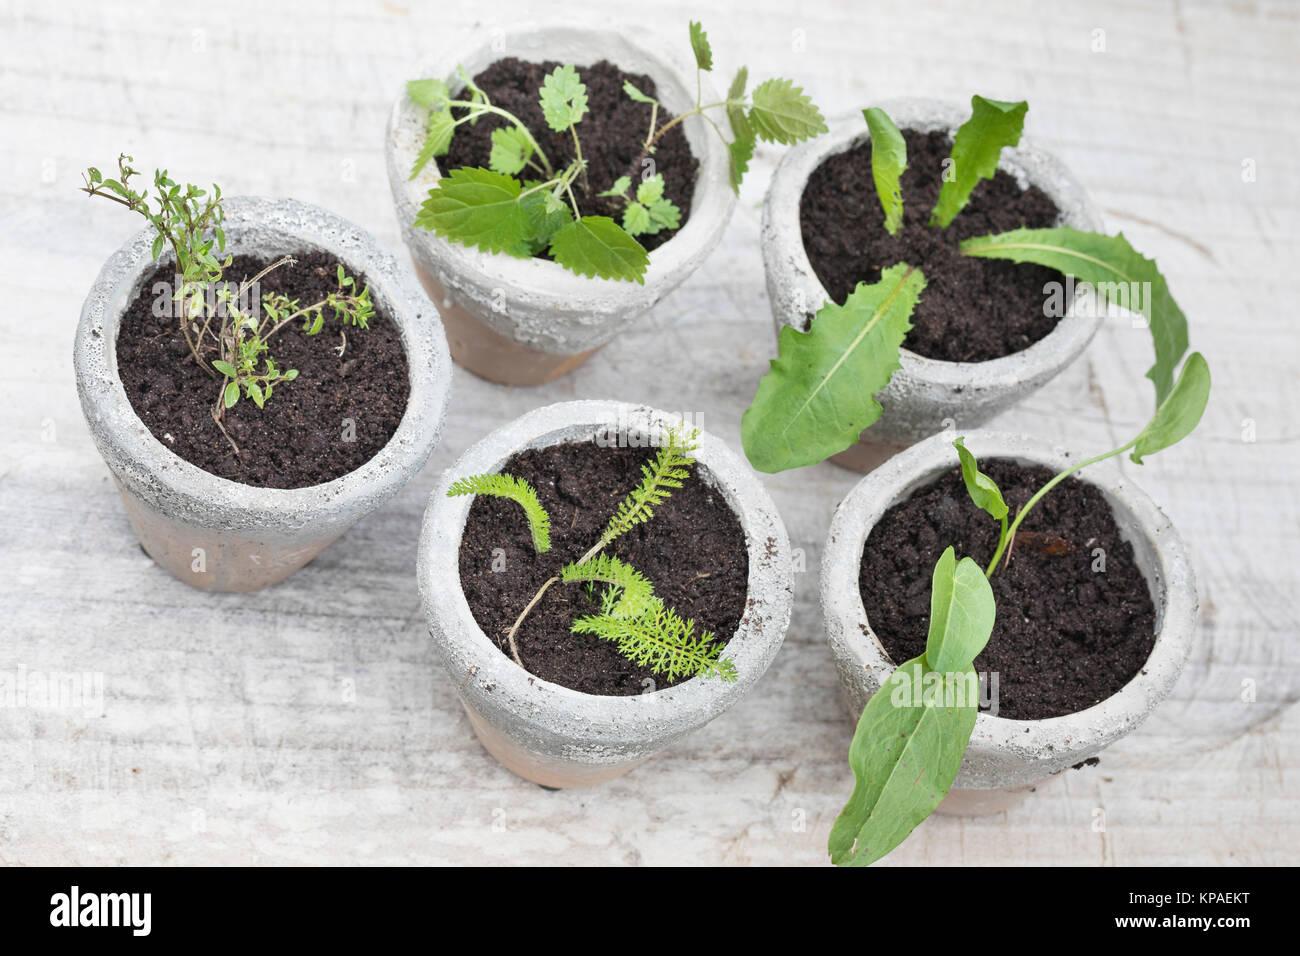 Perfect Wildkruter In Tpfen Topf Blumentopf Tpfe Blumentpfe Oregano  Schafgarbe With Groe Blumentpfe With Kaktus Kpa